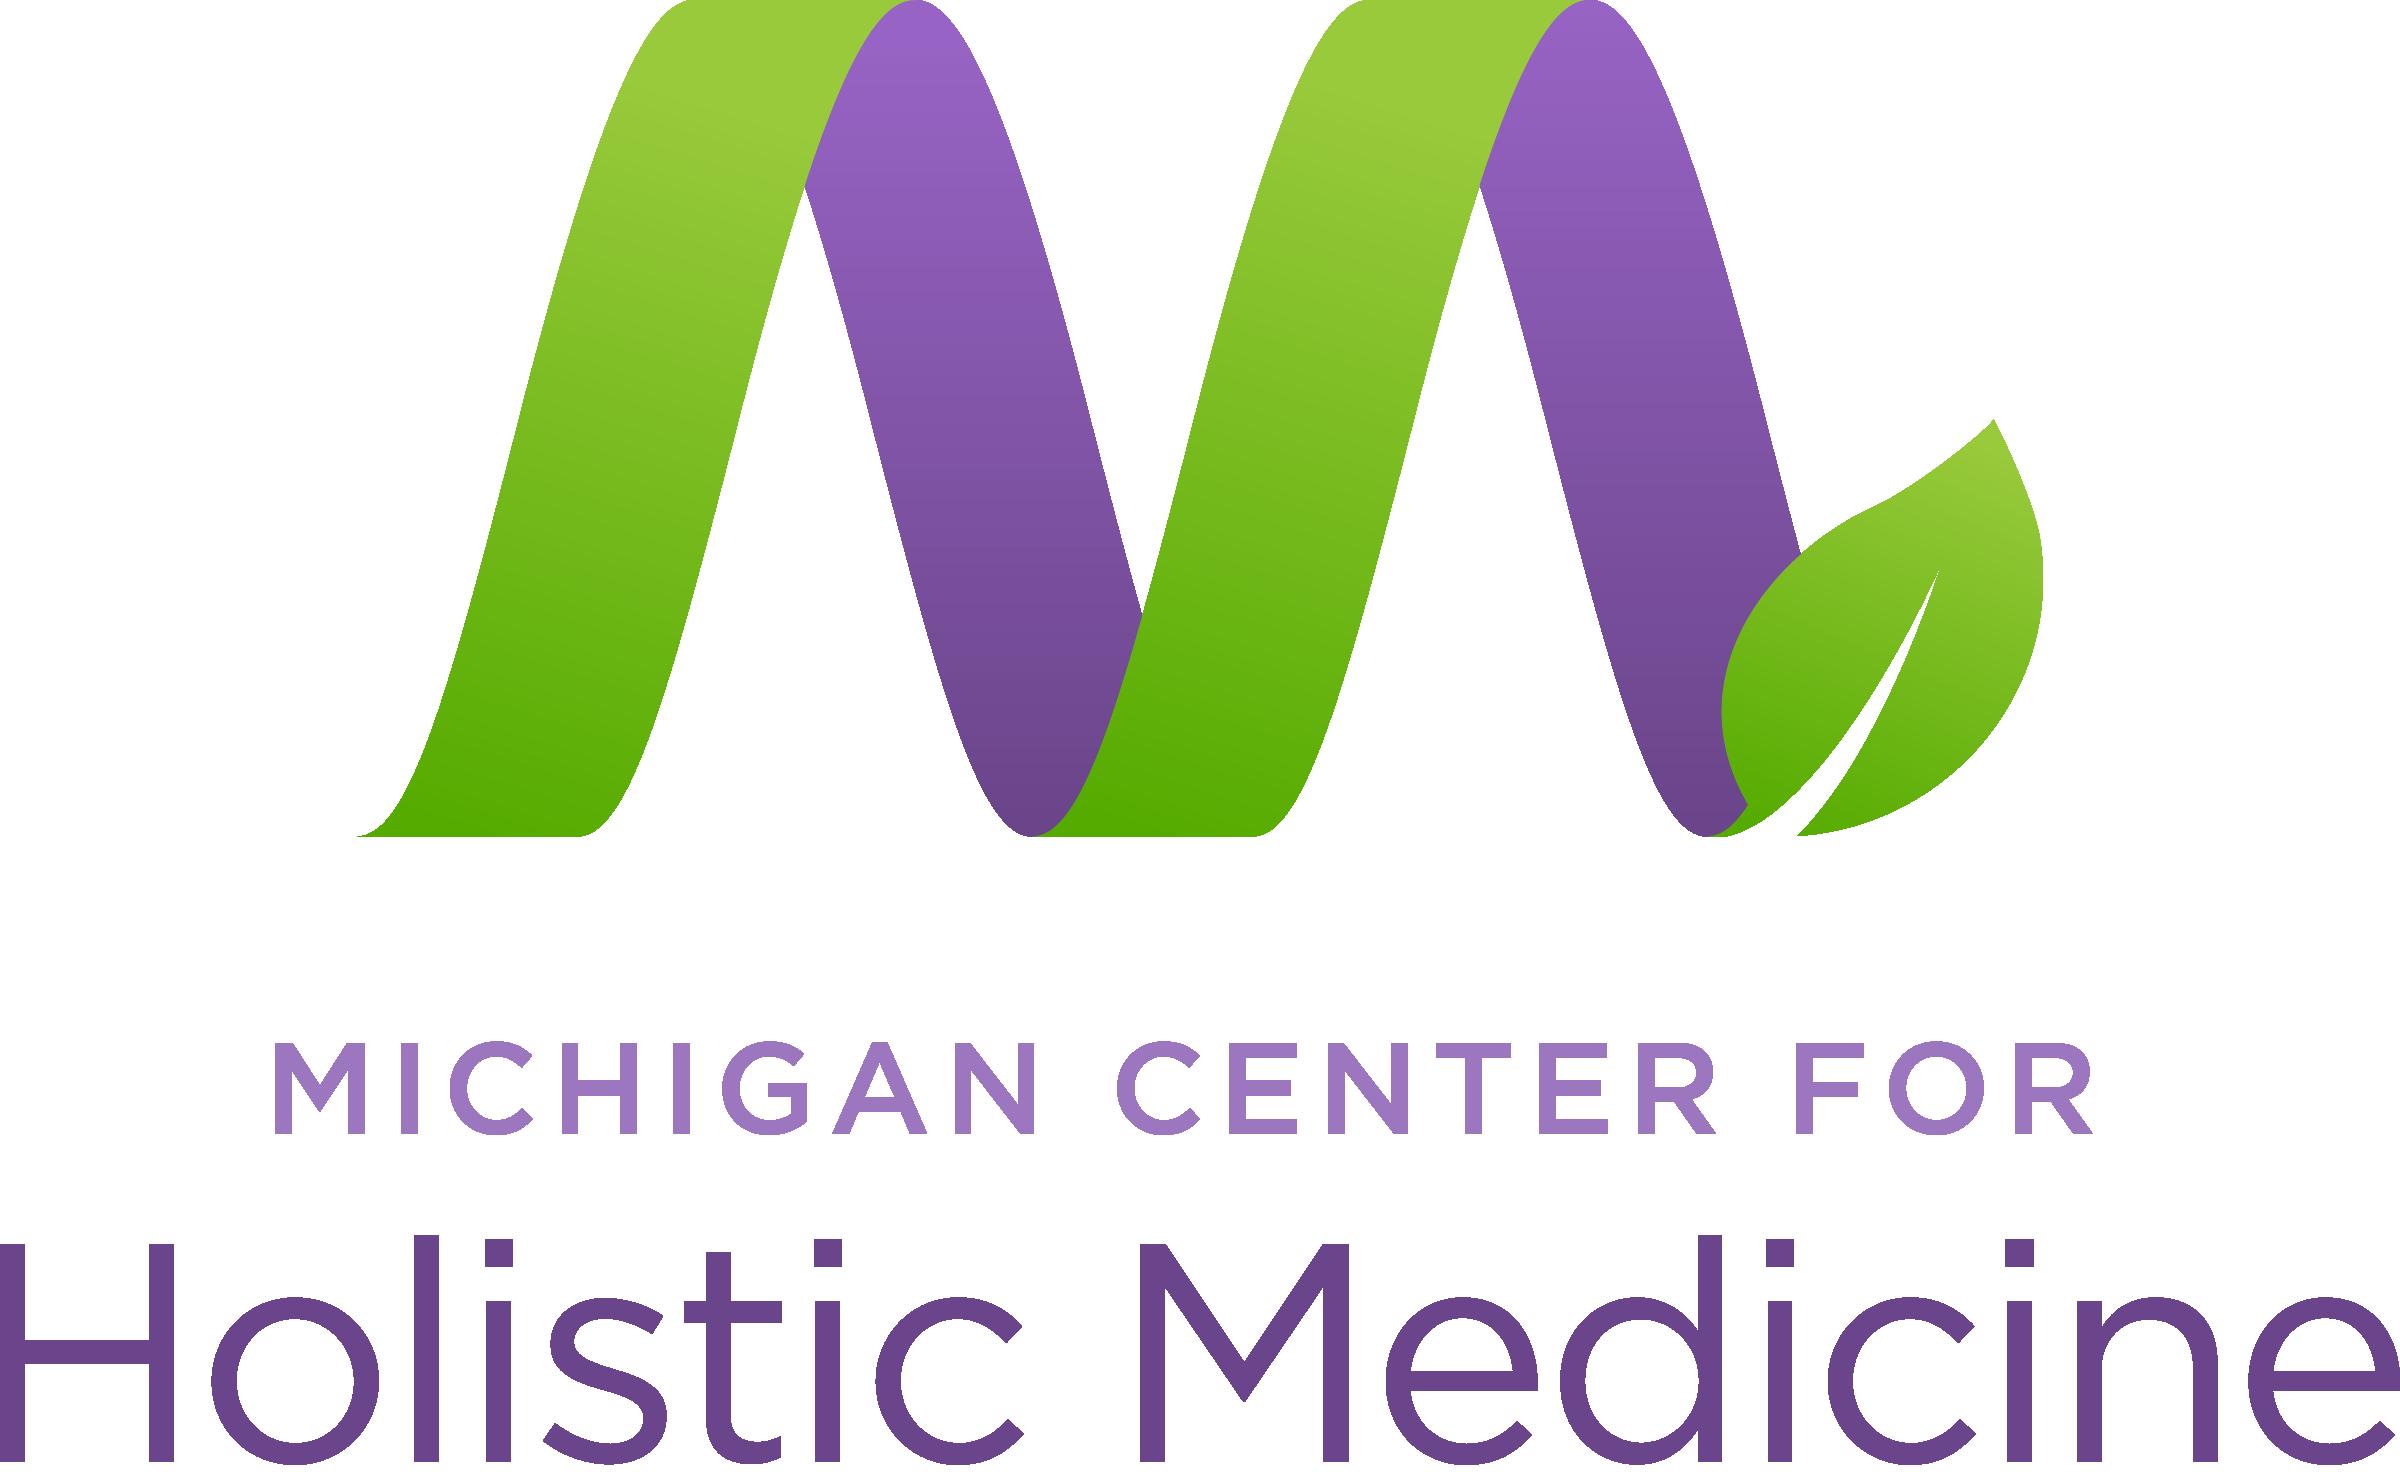 Michigan Center for Holistic Medicine